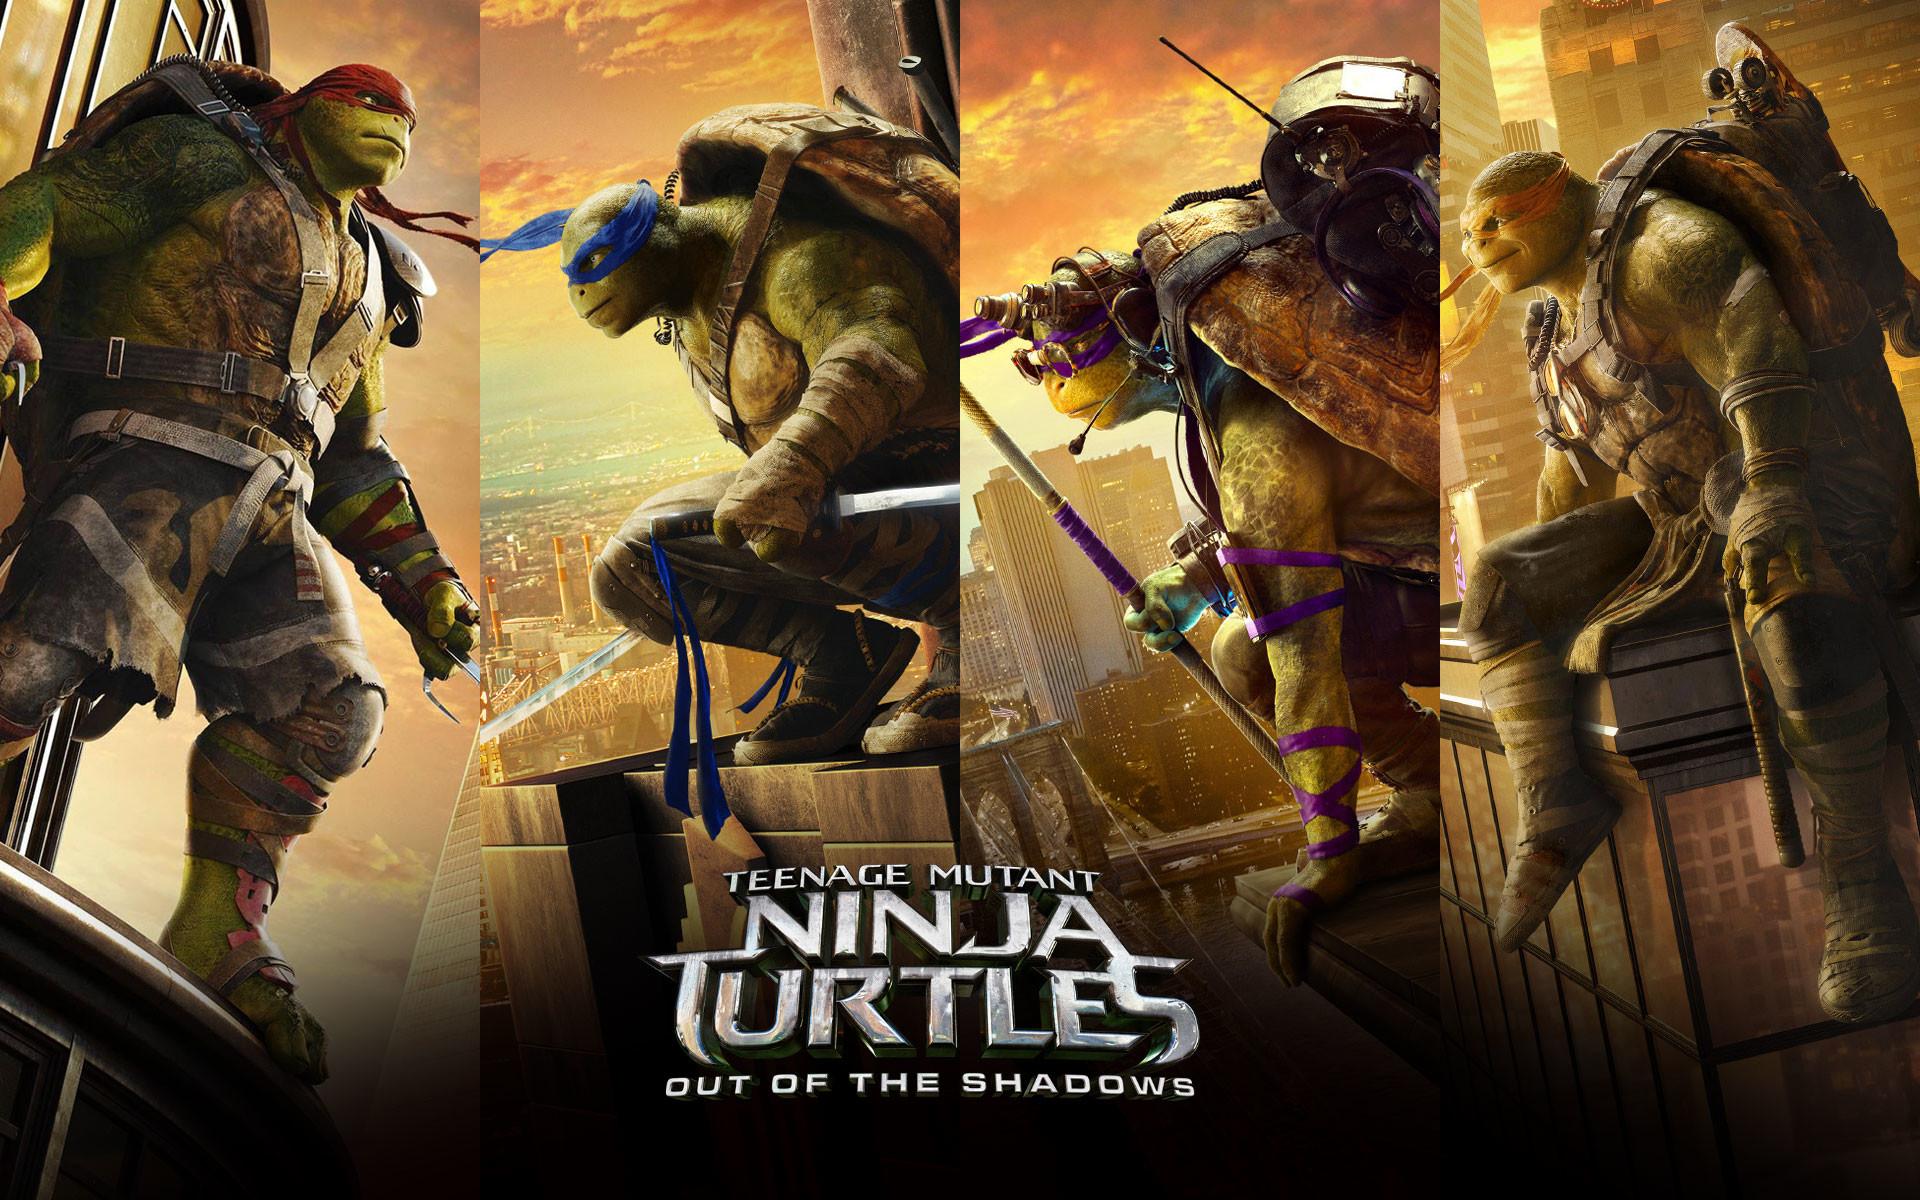 Donatello, Leonardo, Michelangelo, Raphael Official Wallpaper.  TMNT_2_Teenage_Mutant_Ninja_Turtles_2016_Wallpaper_HD_1920_x_1200_px